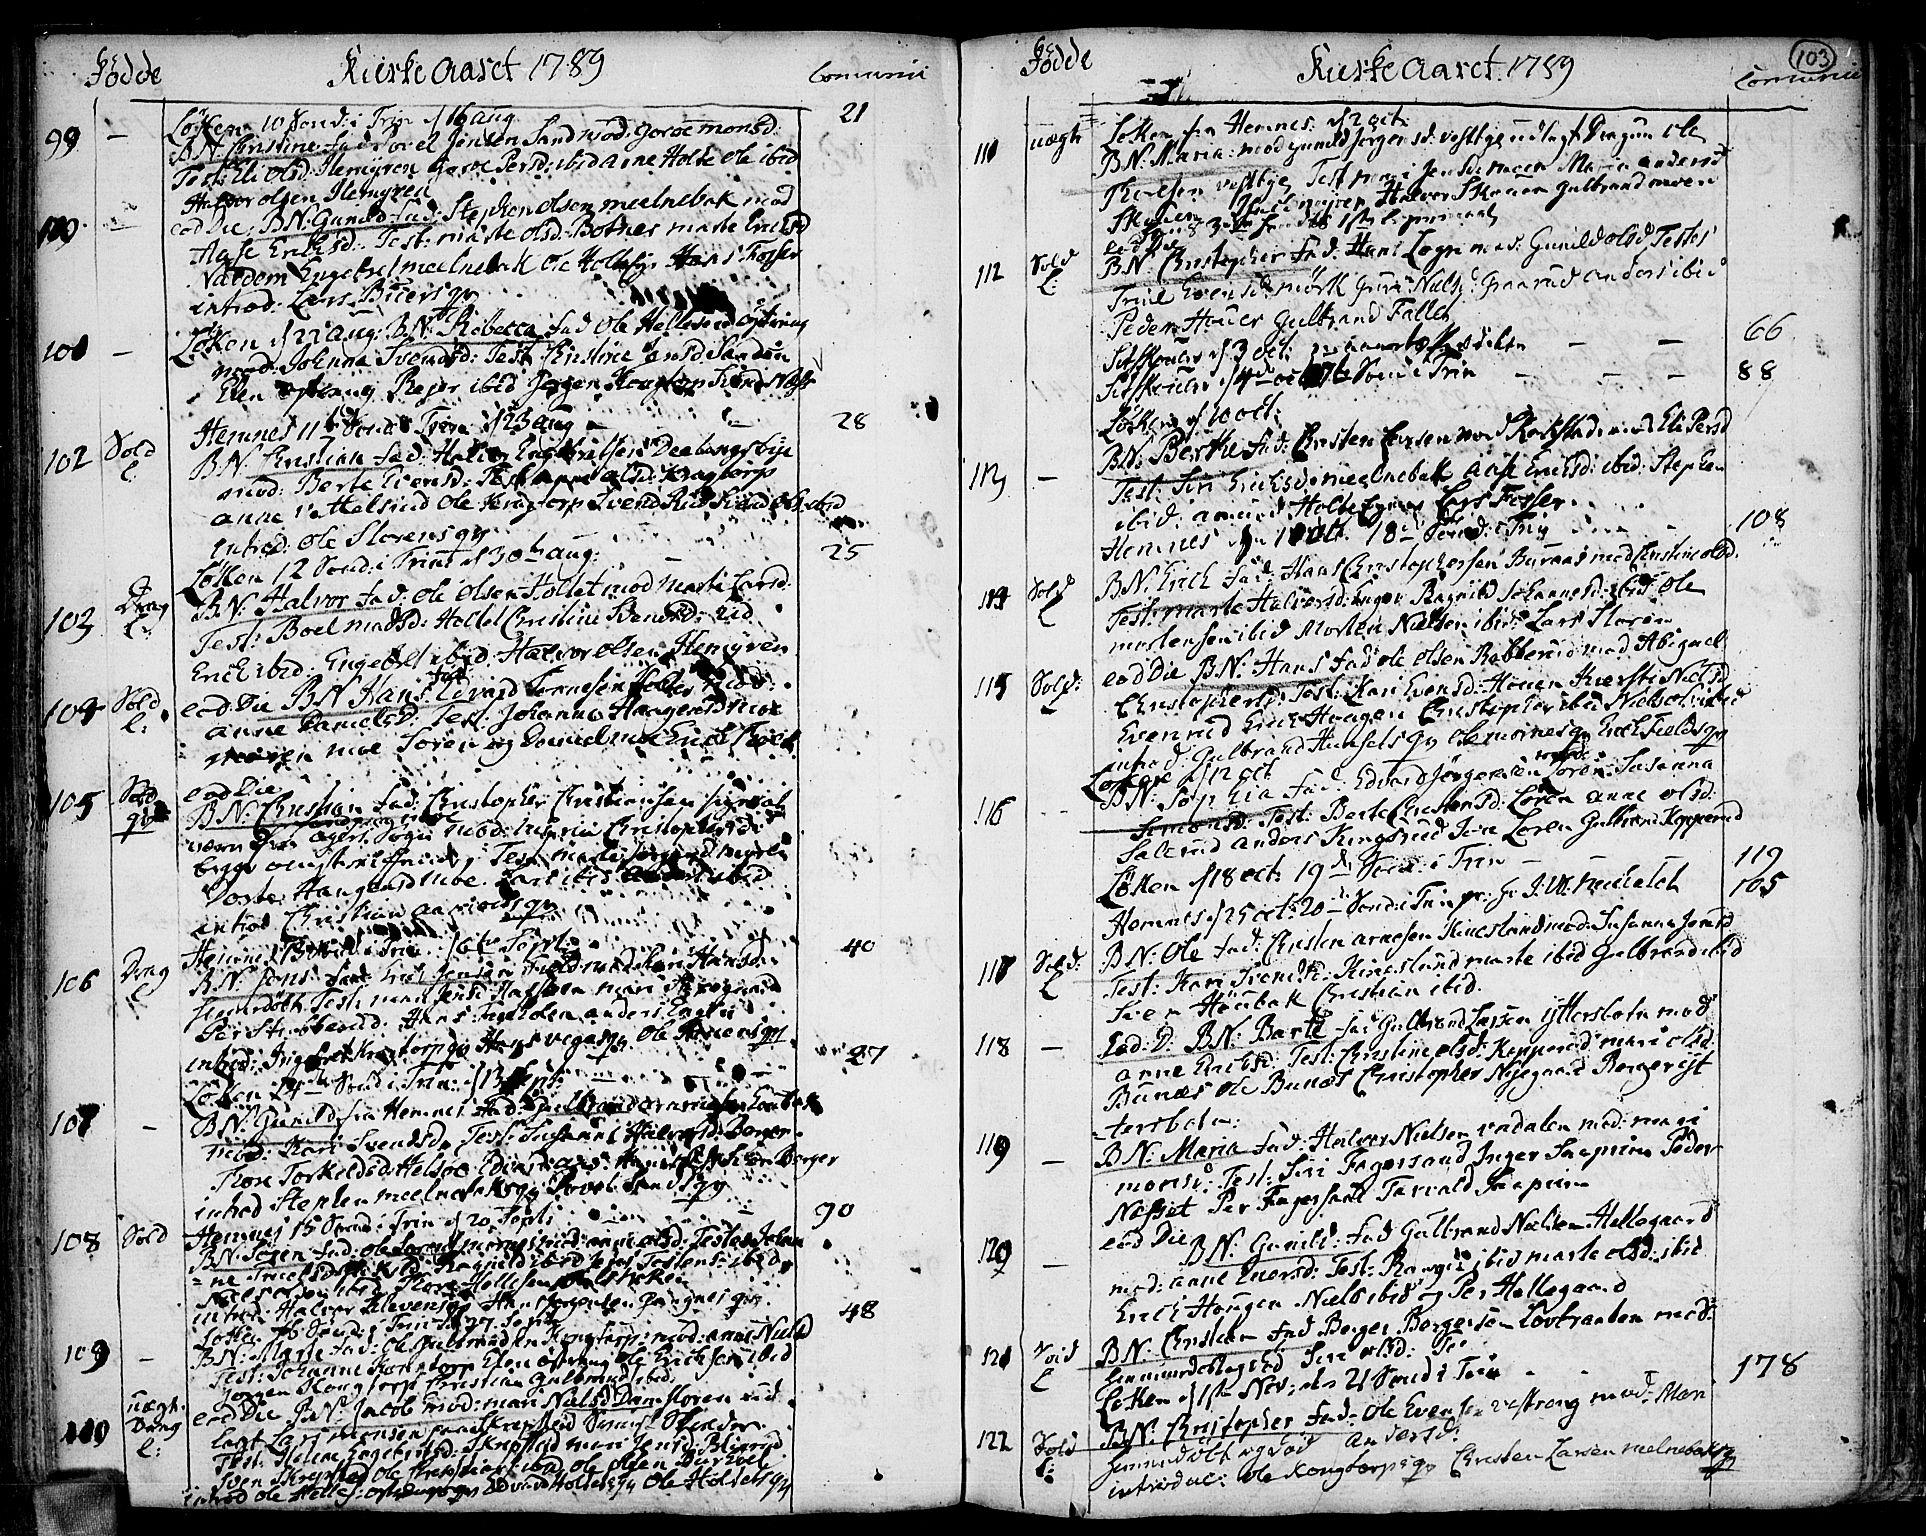 SAO, Høland prestekontor Kirkebøker, F/Fa/L0005: Ministerialbok nr. I 5, 1780-1793, s. 103